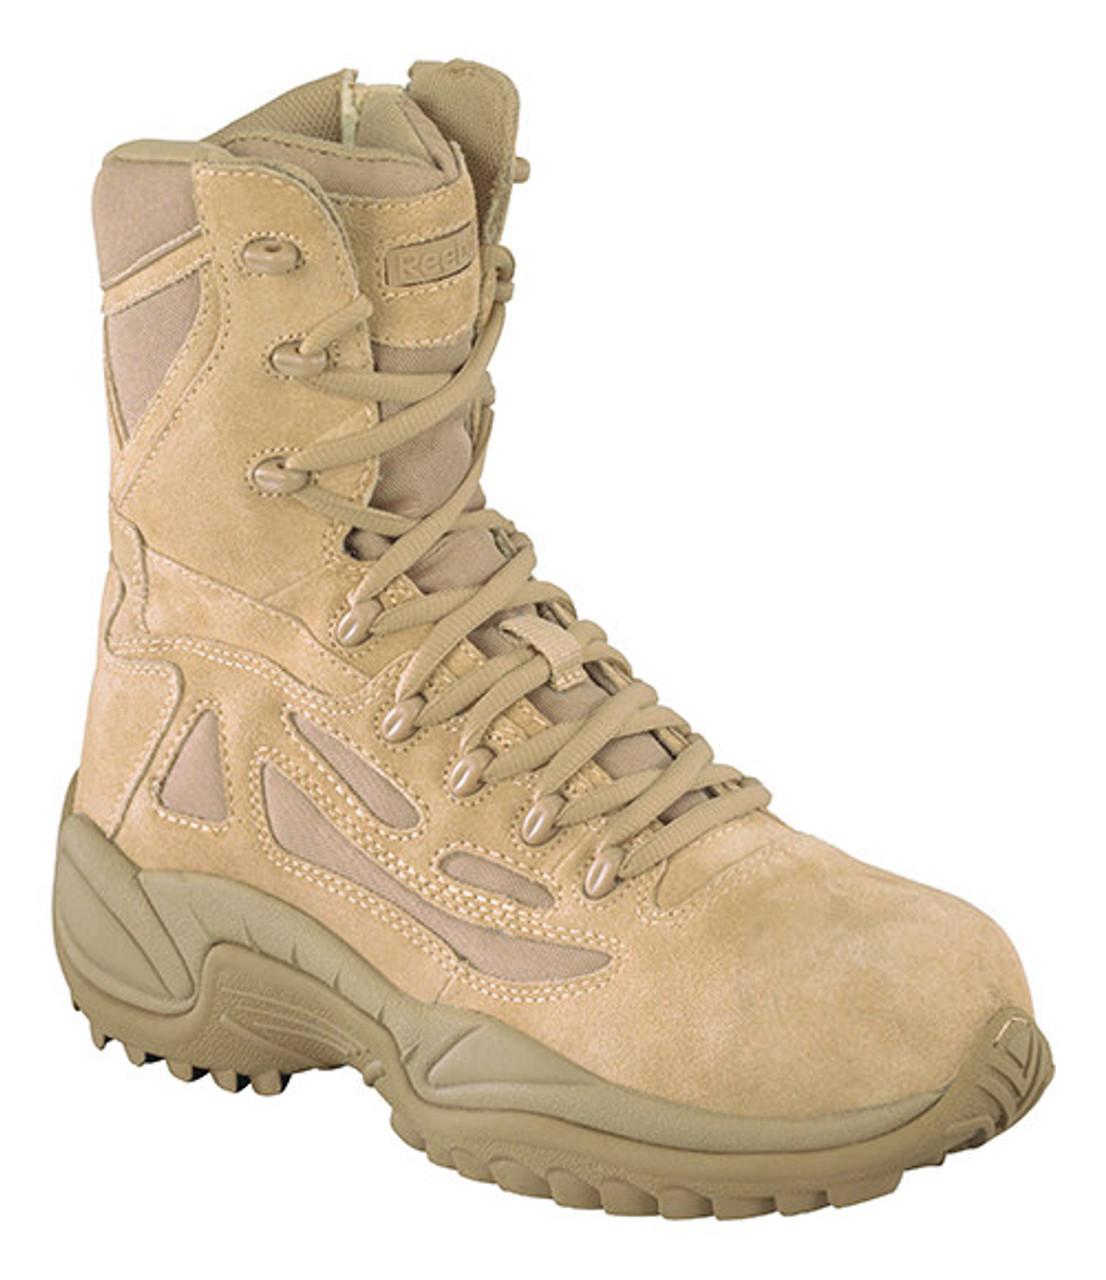 Reebok RB8990 Composite Toe Side Zip Rapid Response Boots